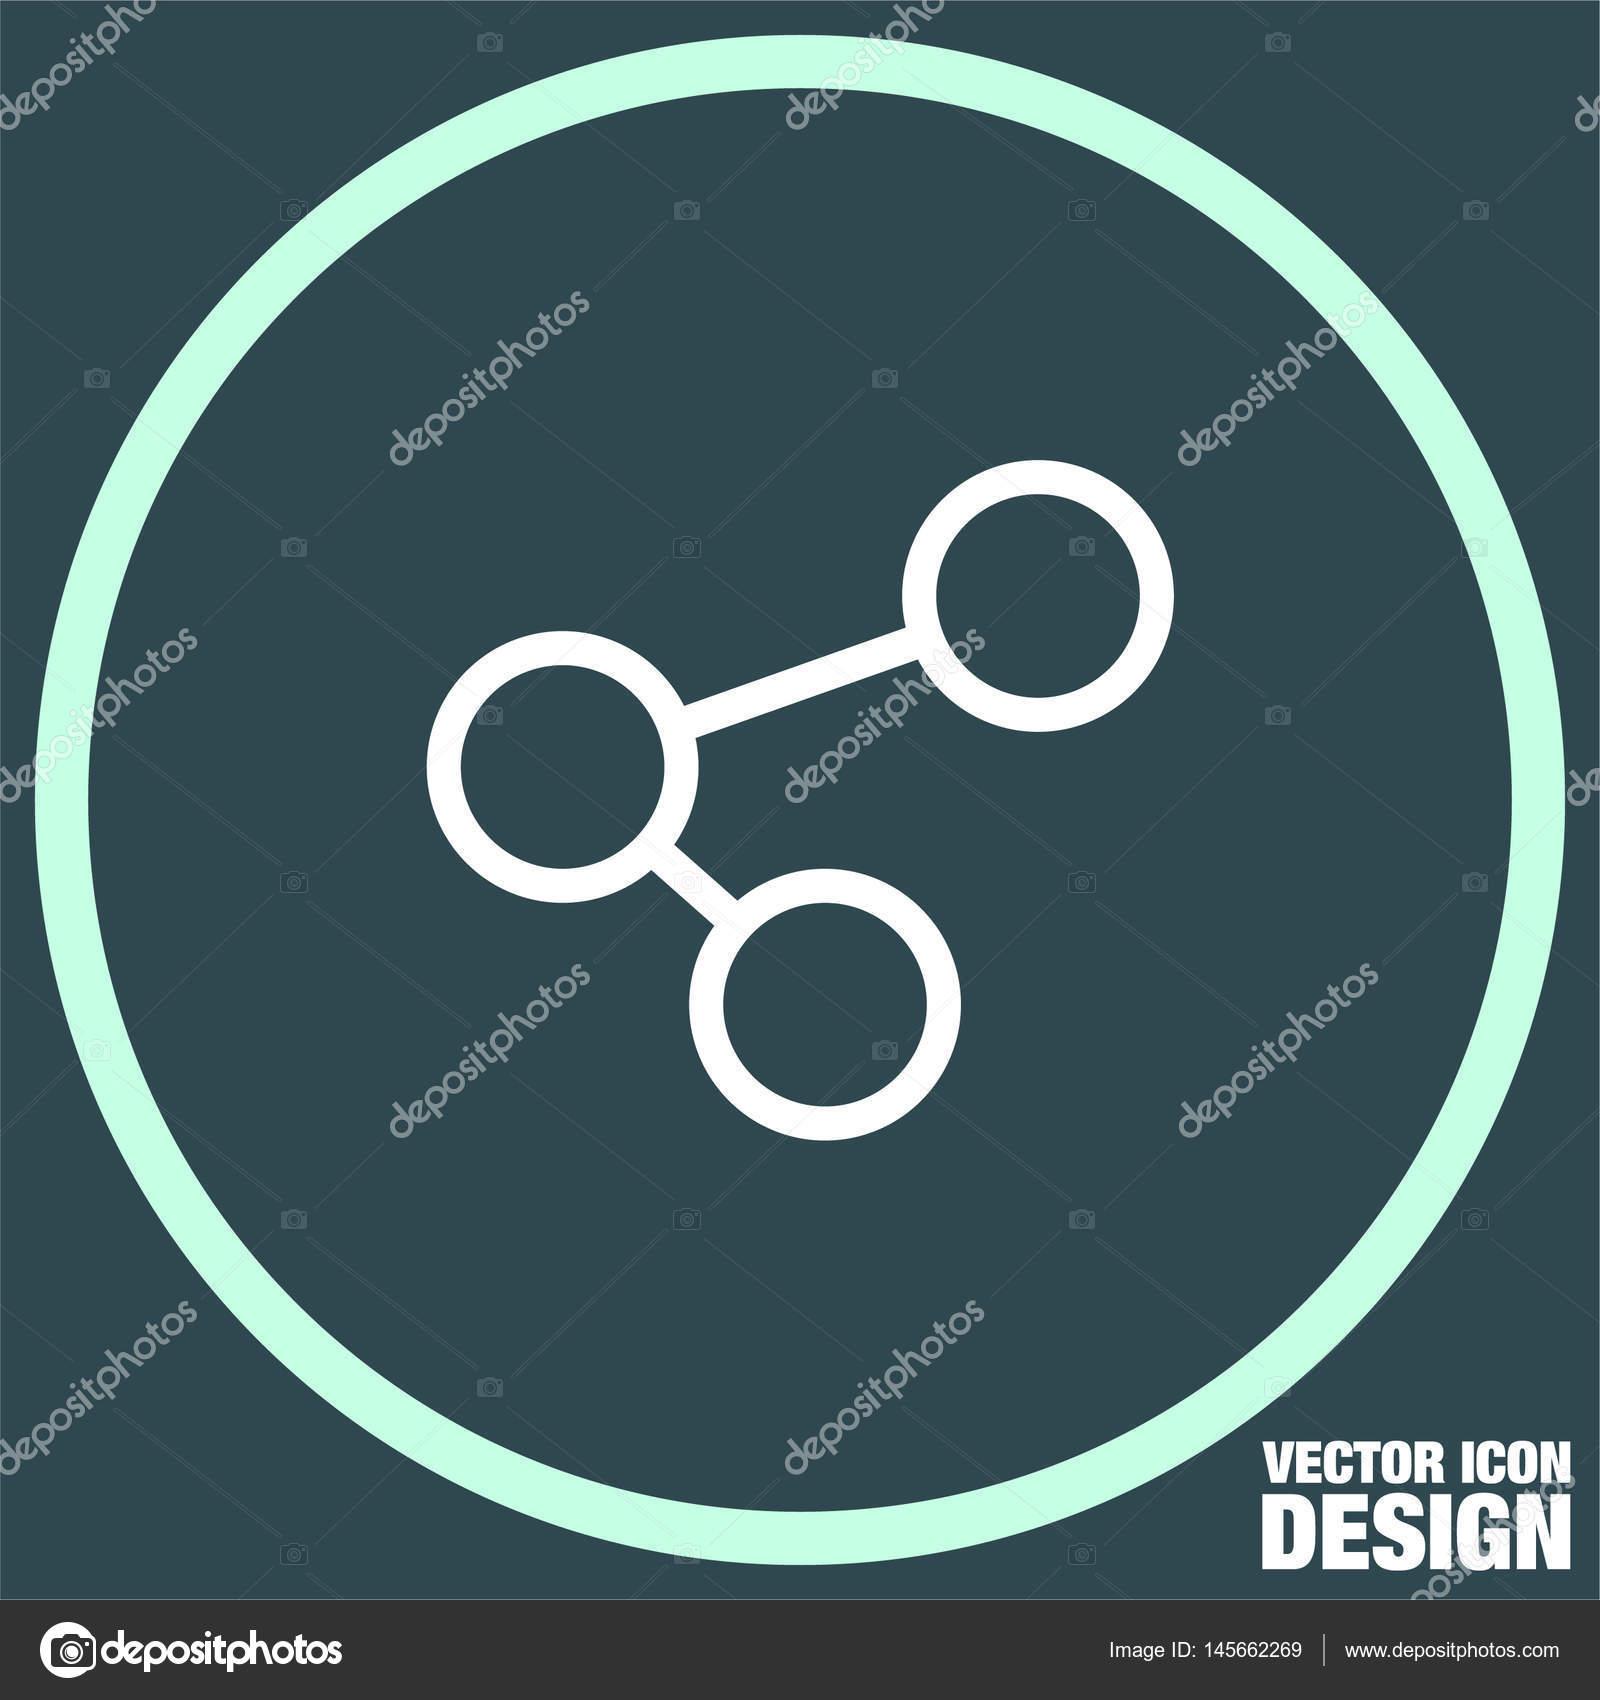 Social media data transfer symbol stock vector quka 145662269 social media data transfer symbol stock vector biocorpaavc